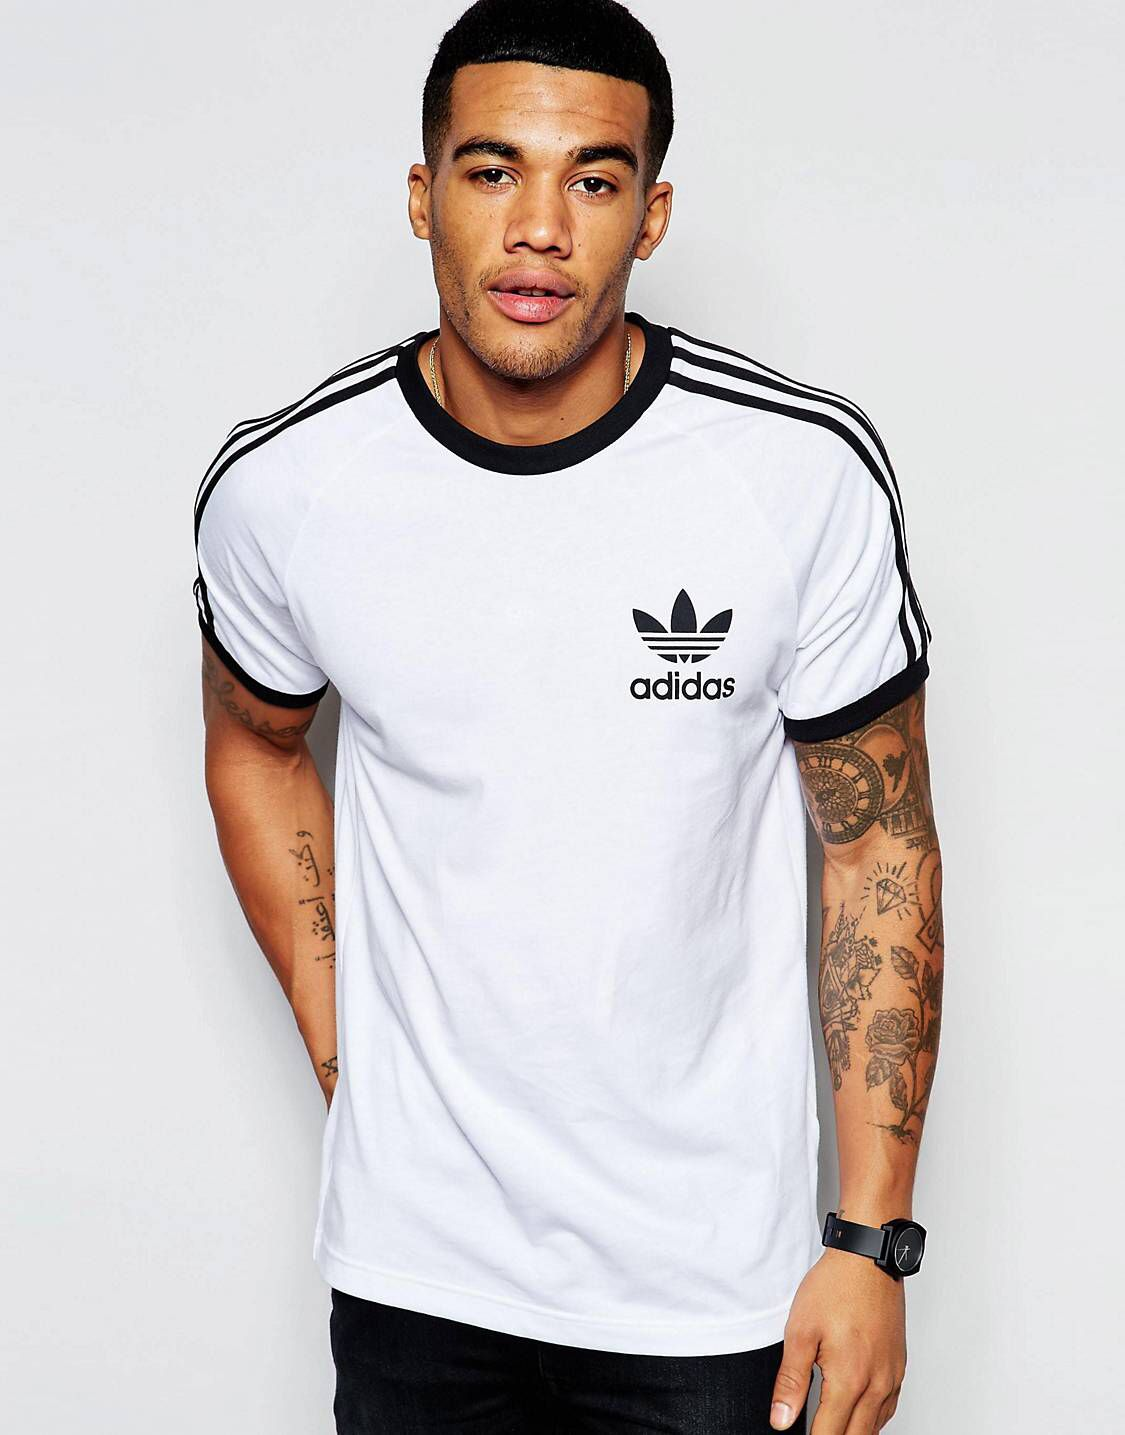 adidas Originals California T Shirt AJ8833 | Stuff | White